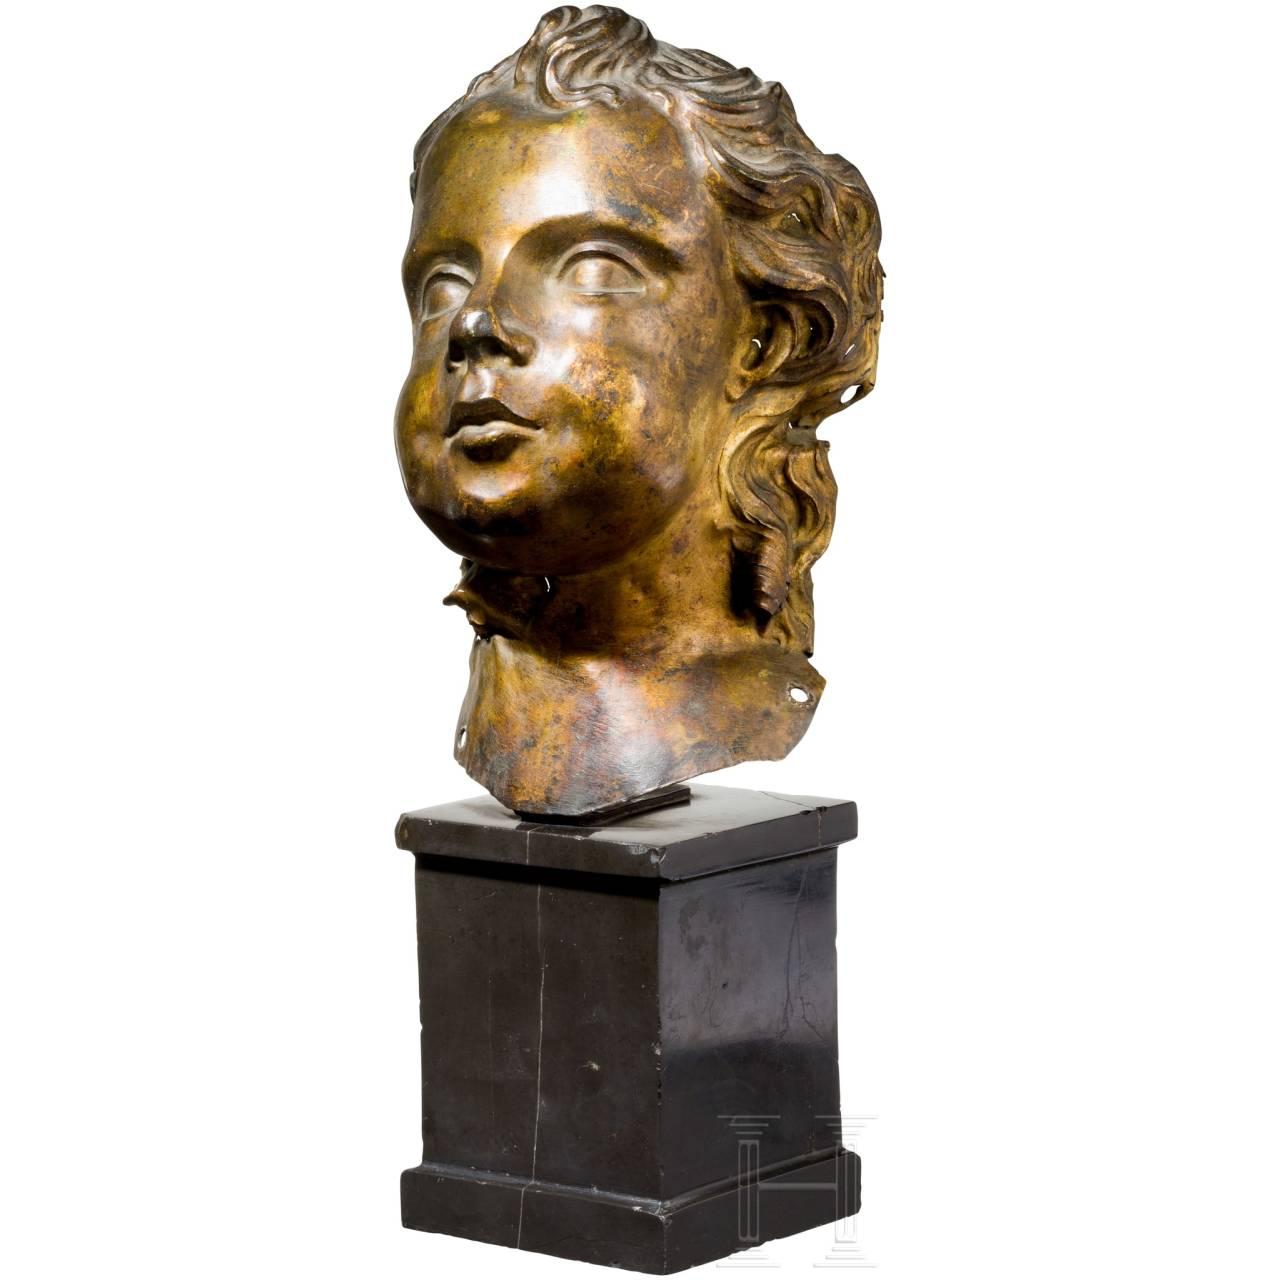 An Italian Baroque head of a putto, 17th century